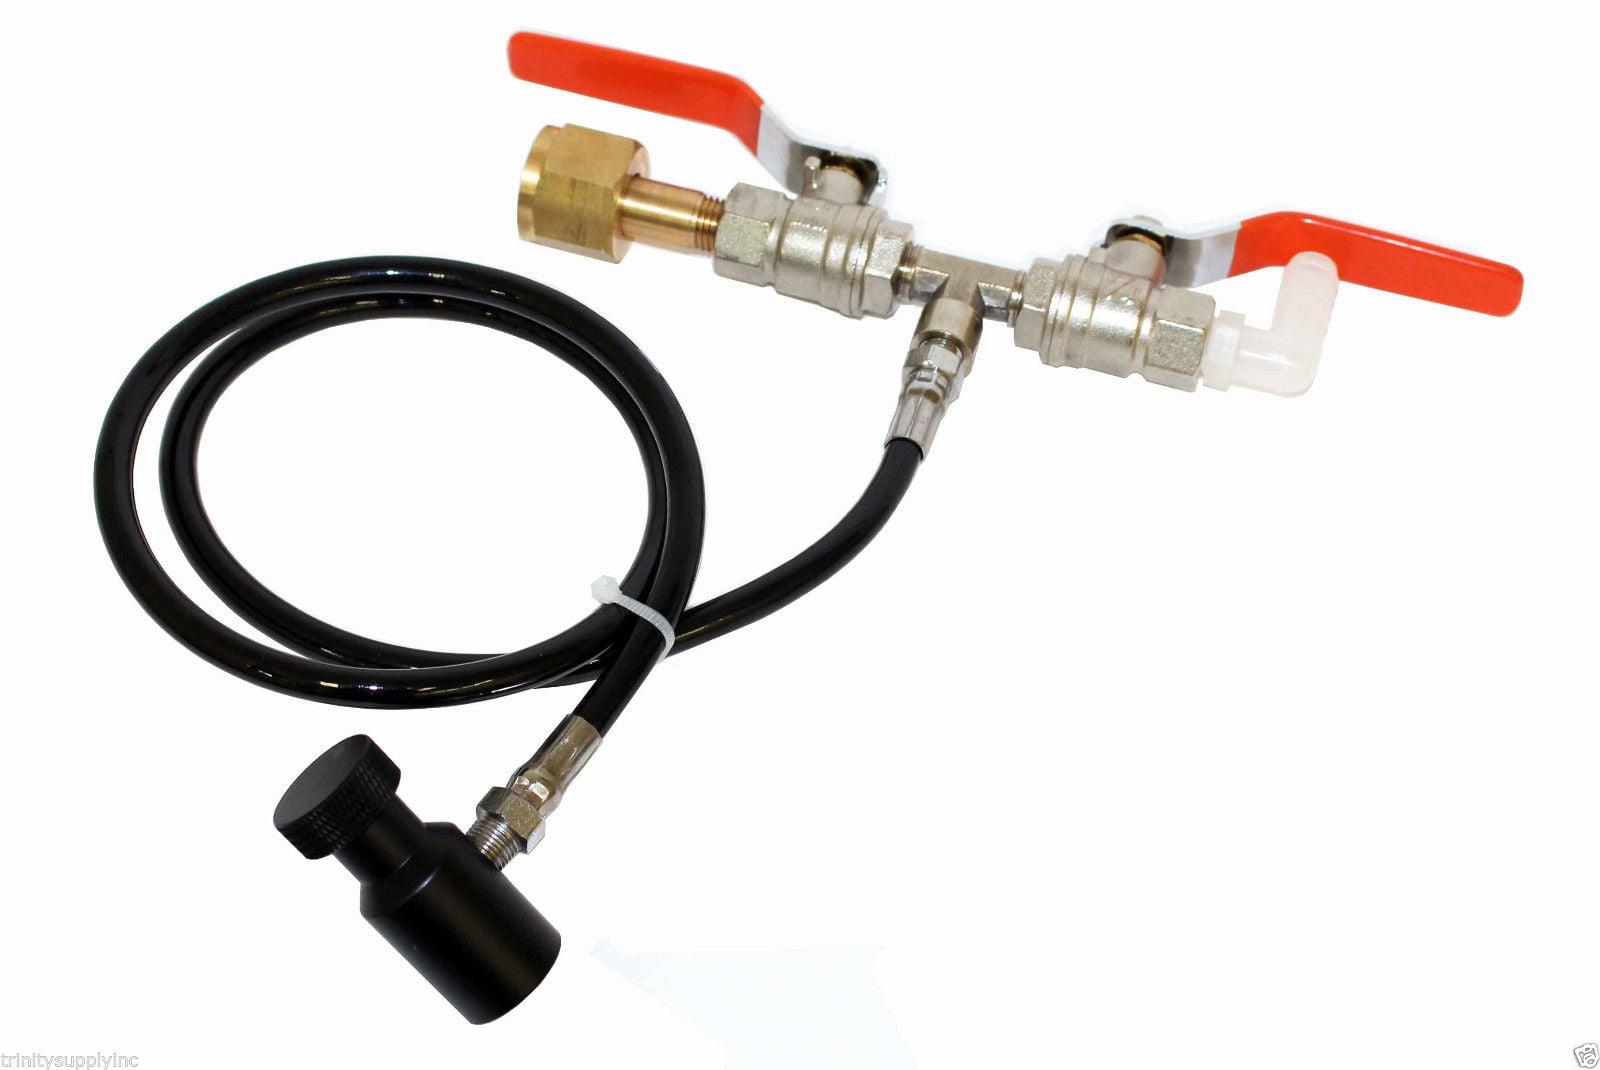 CO2 refill station for DRINKMATE soda maker co2 tanks